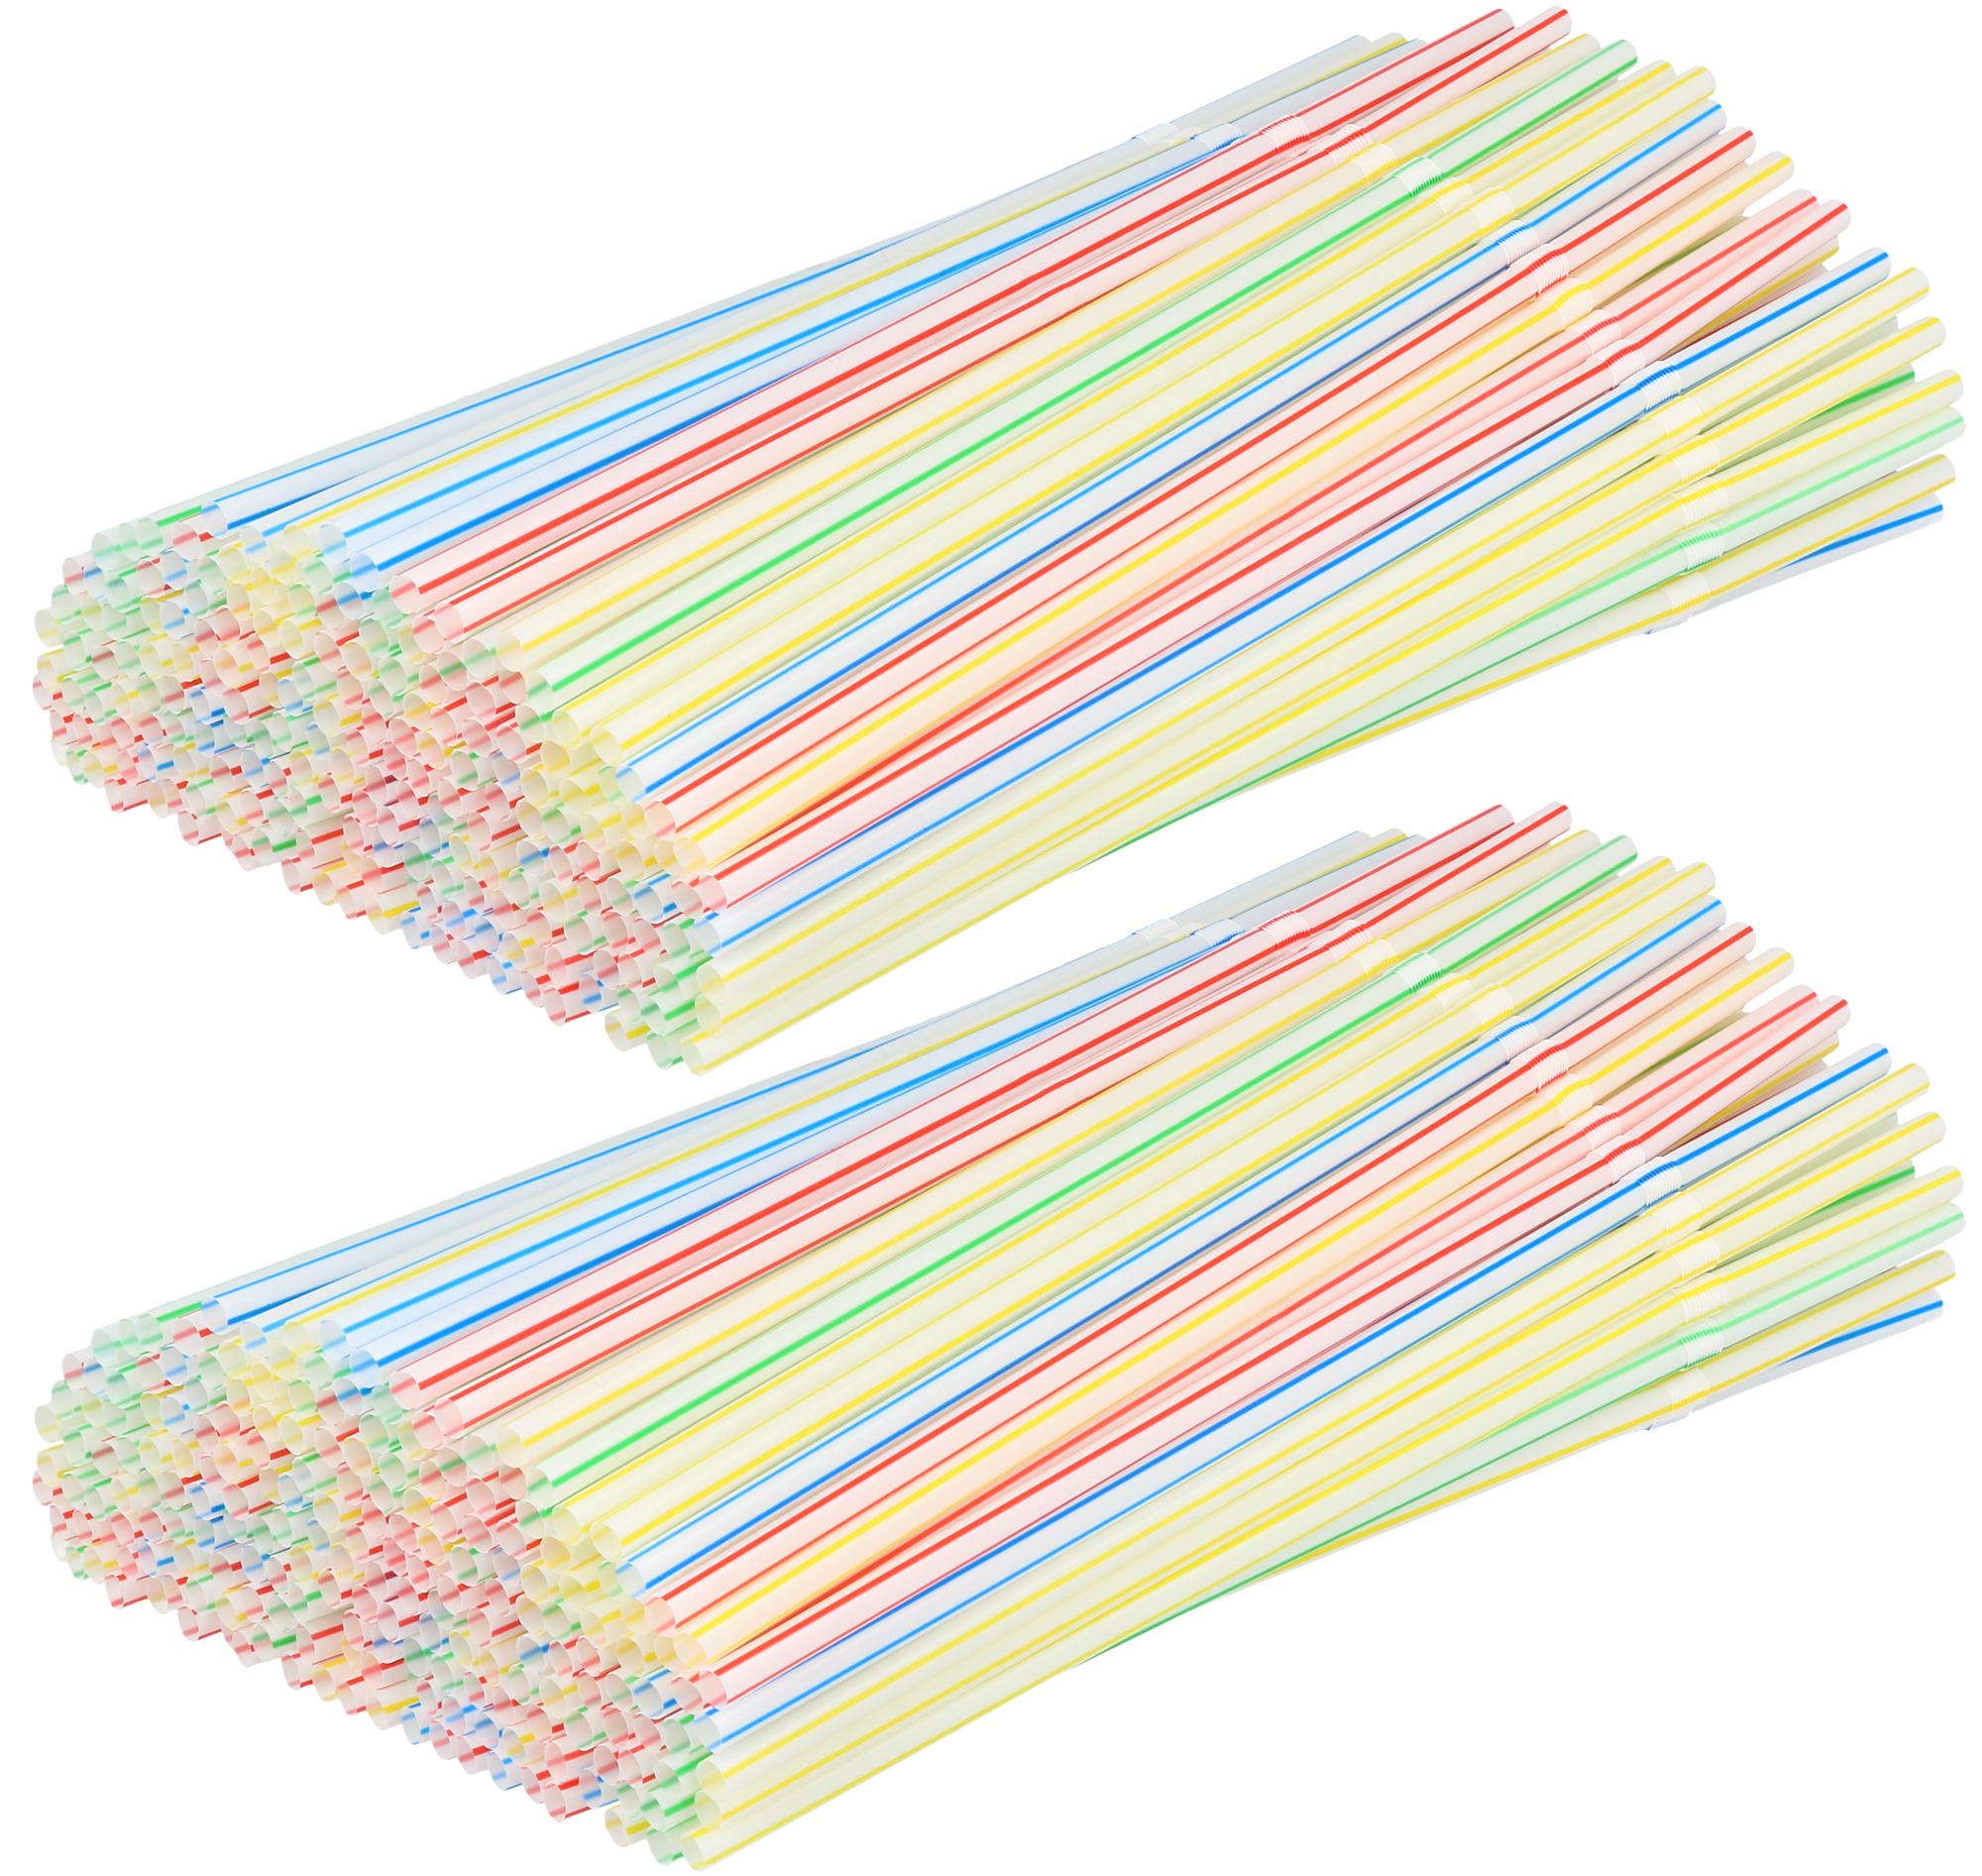 "1000 transparente Trinkhalme flexibel Ø 5 mm 24 cm /""Streifen/"" Party Strohhalme"